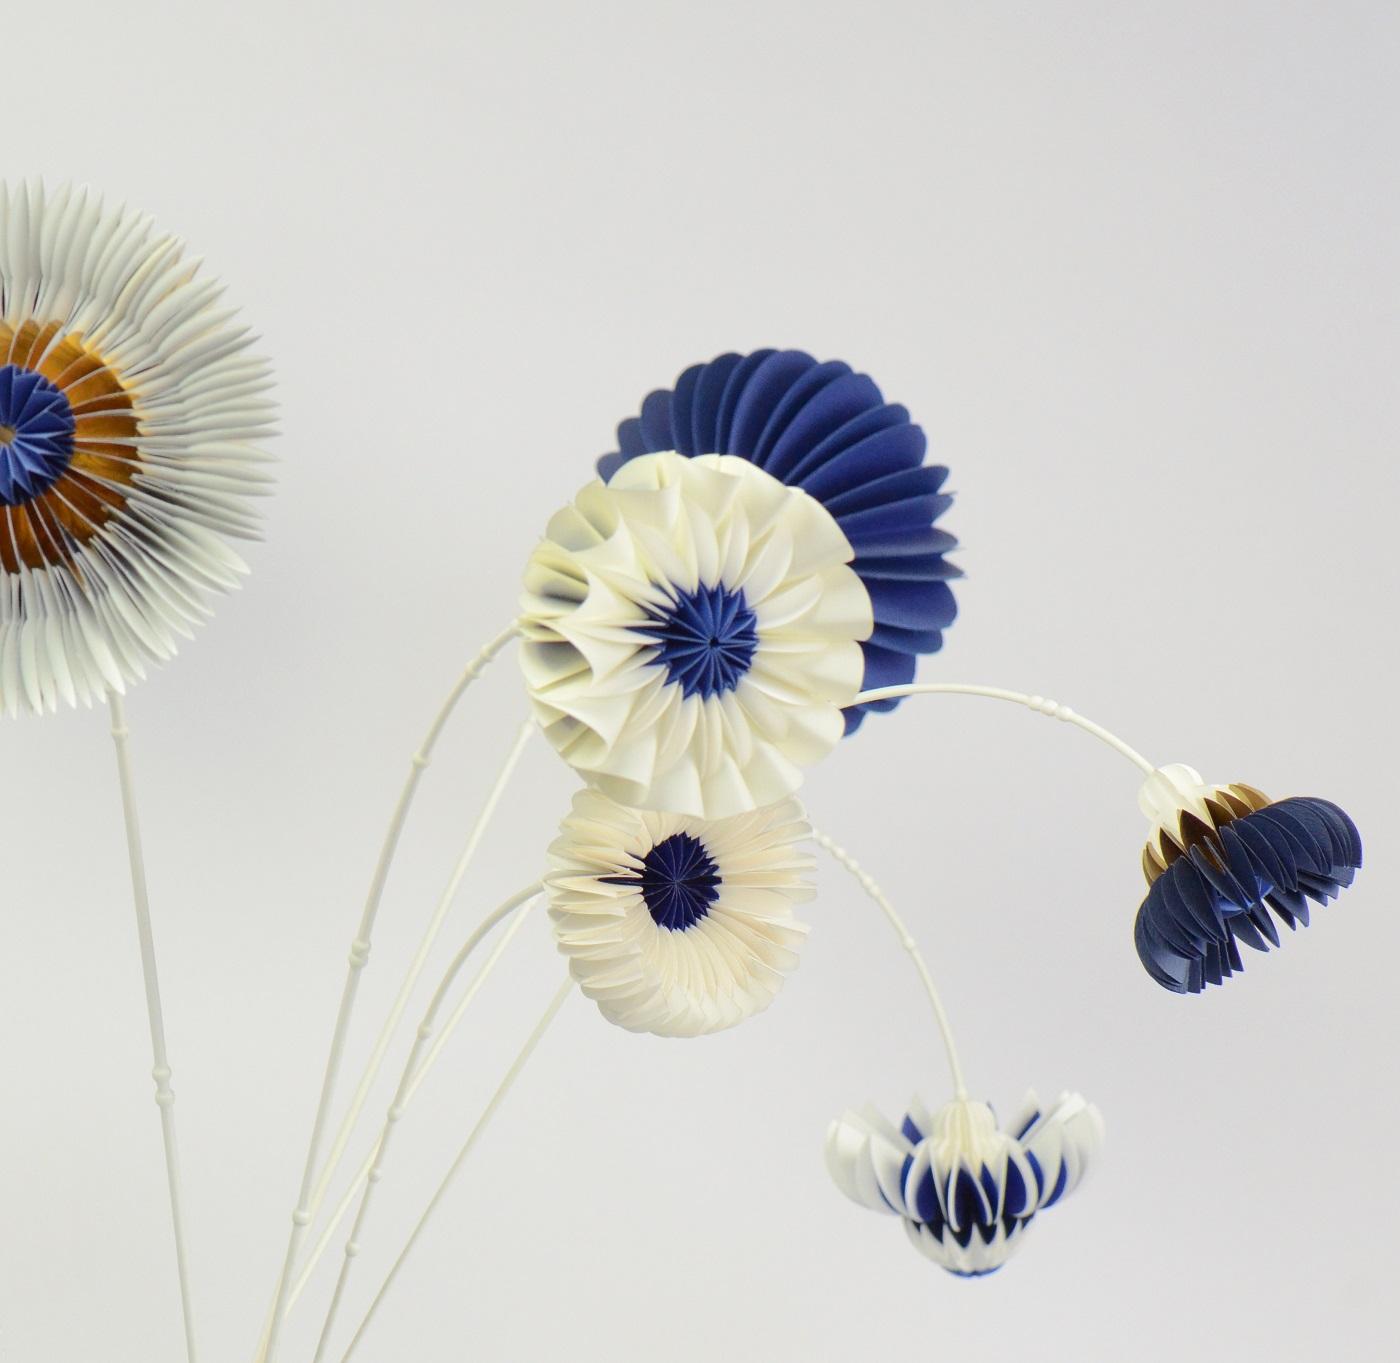 Paperflowers blauw van Jorine Oosterhoff  in Gimmii Magazine